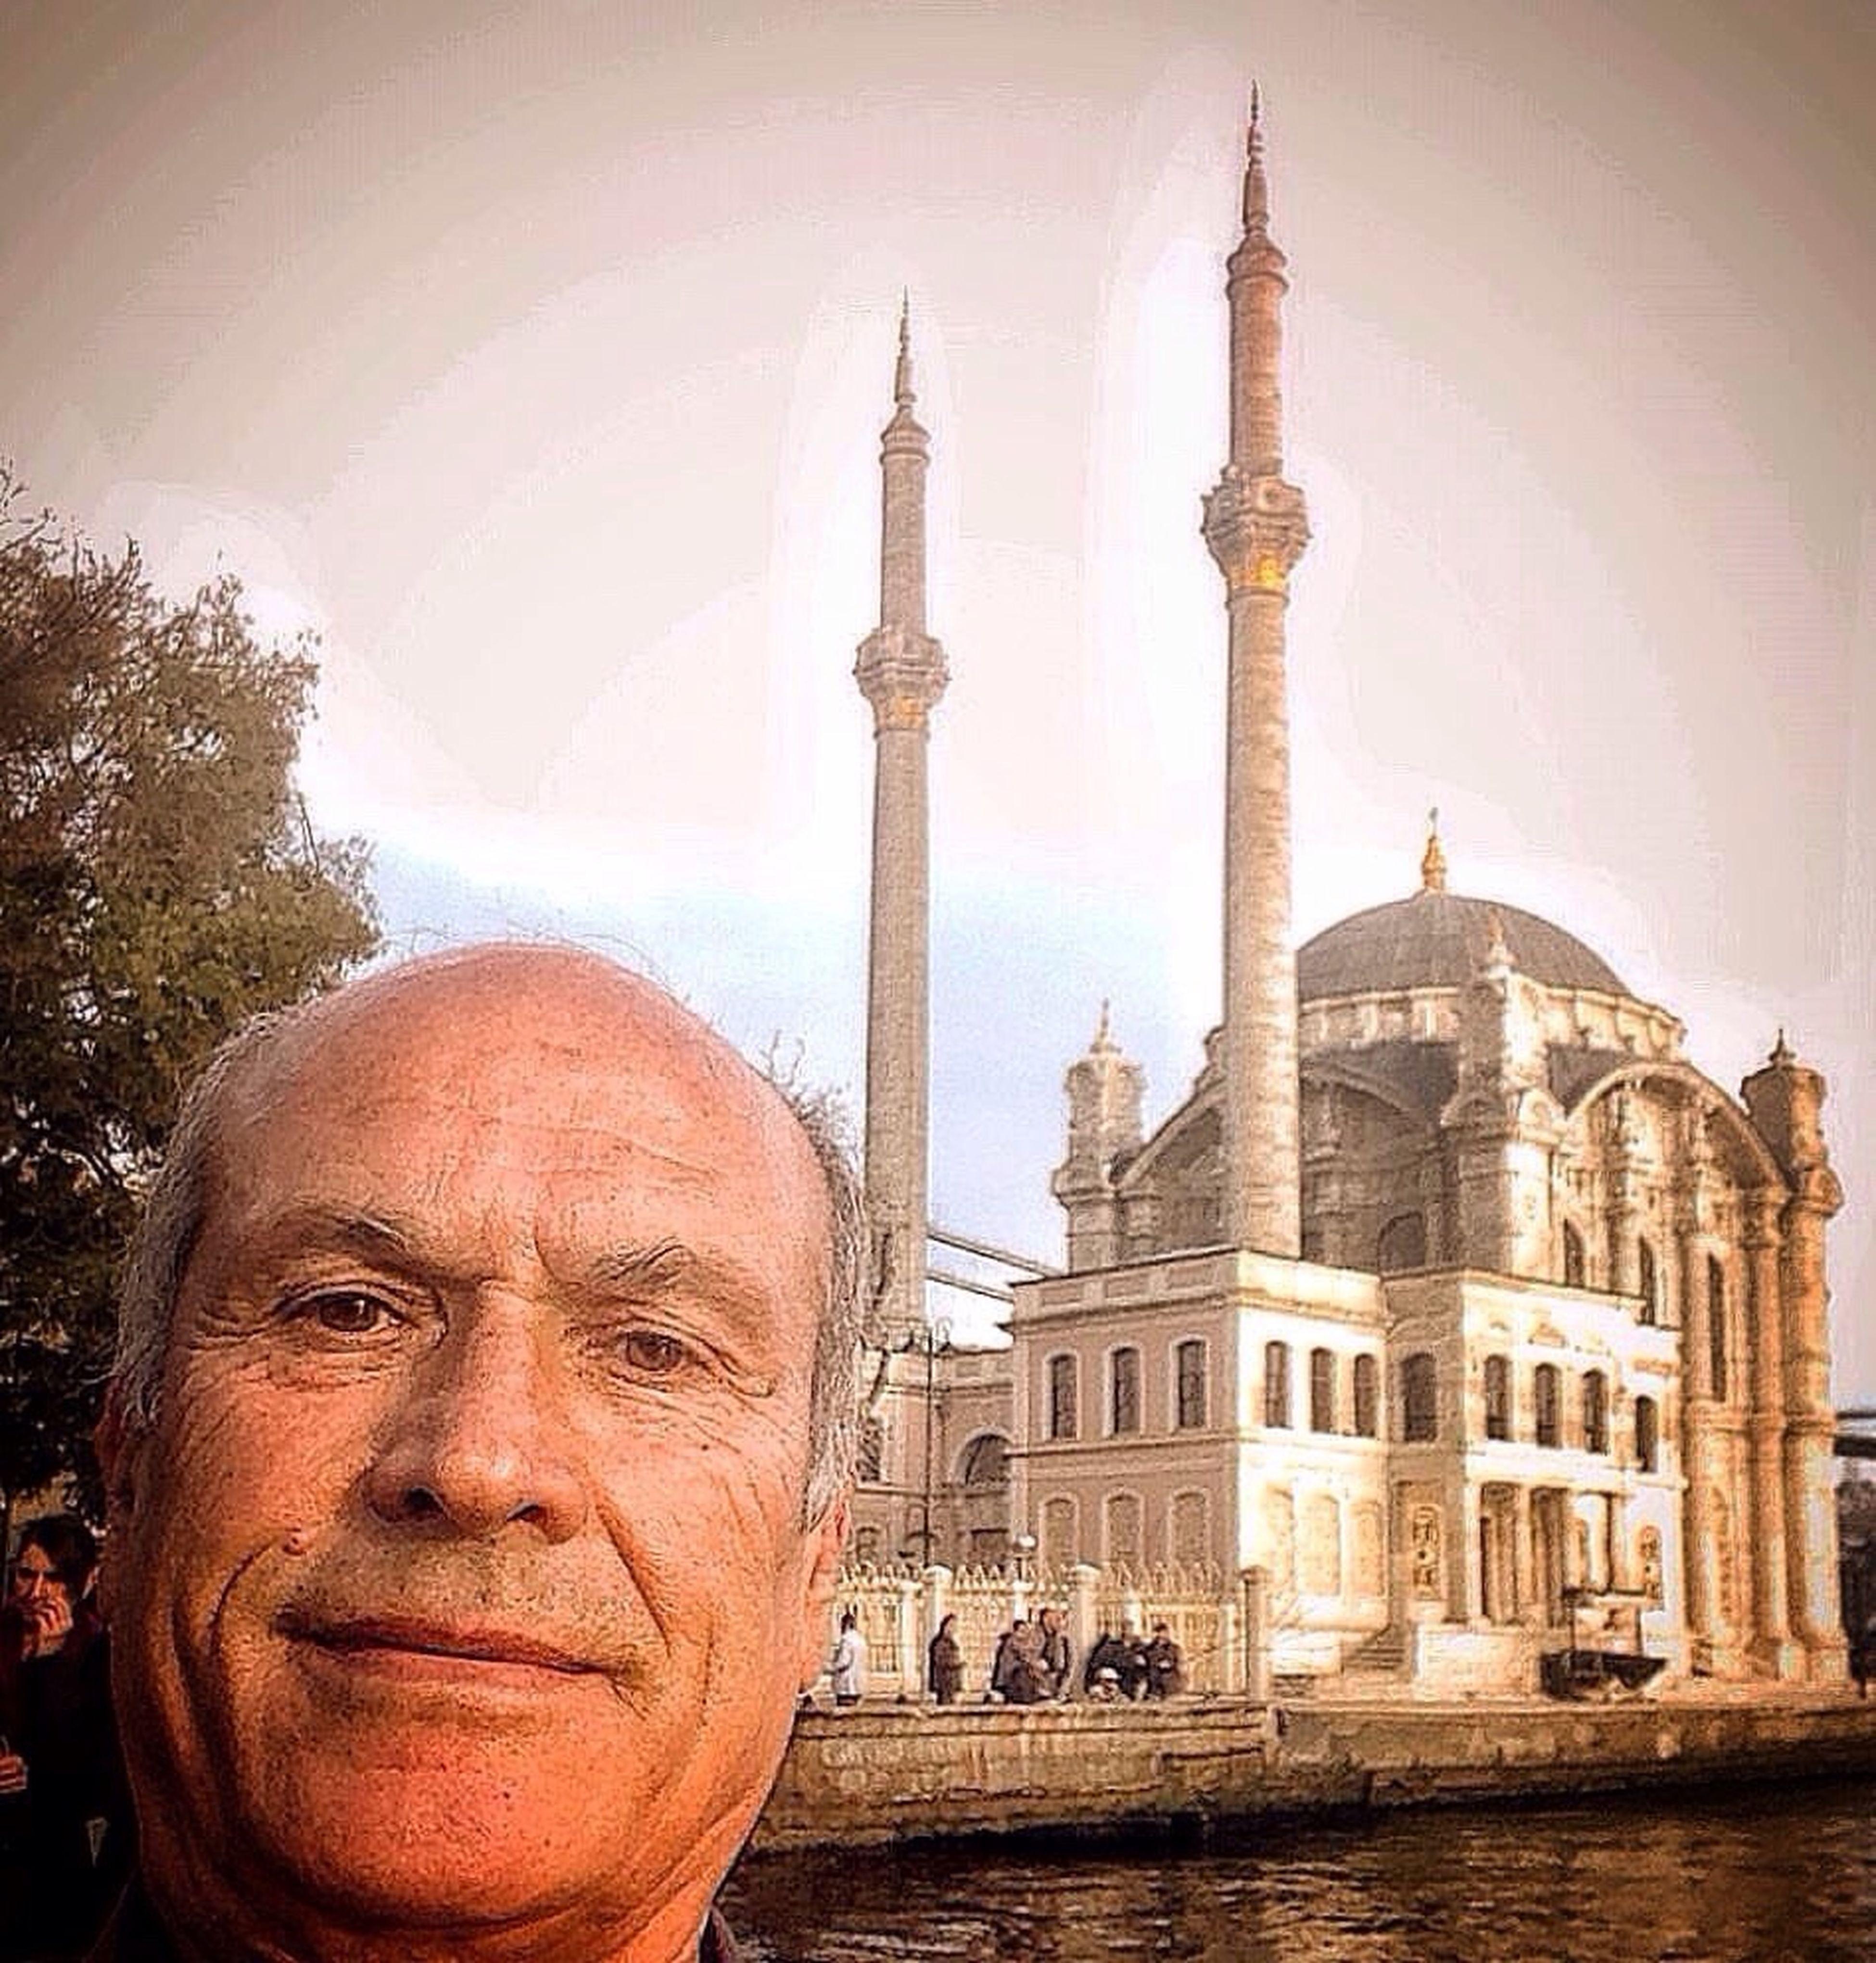 Gezgin Ortaköy'de.. Architecture Ottoman Empire Gazonungözü Selfie Portrait One Man Only Hi Travel Destinations Adults Only Outdoors Istanbullife Myworld Walking Historical City Religion Looking At Camera Leisure Activity